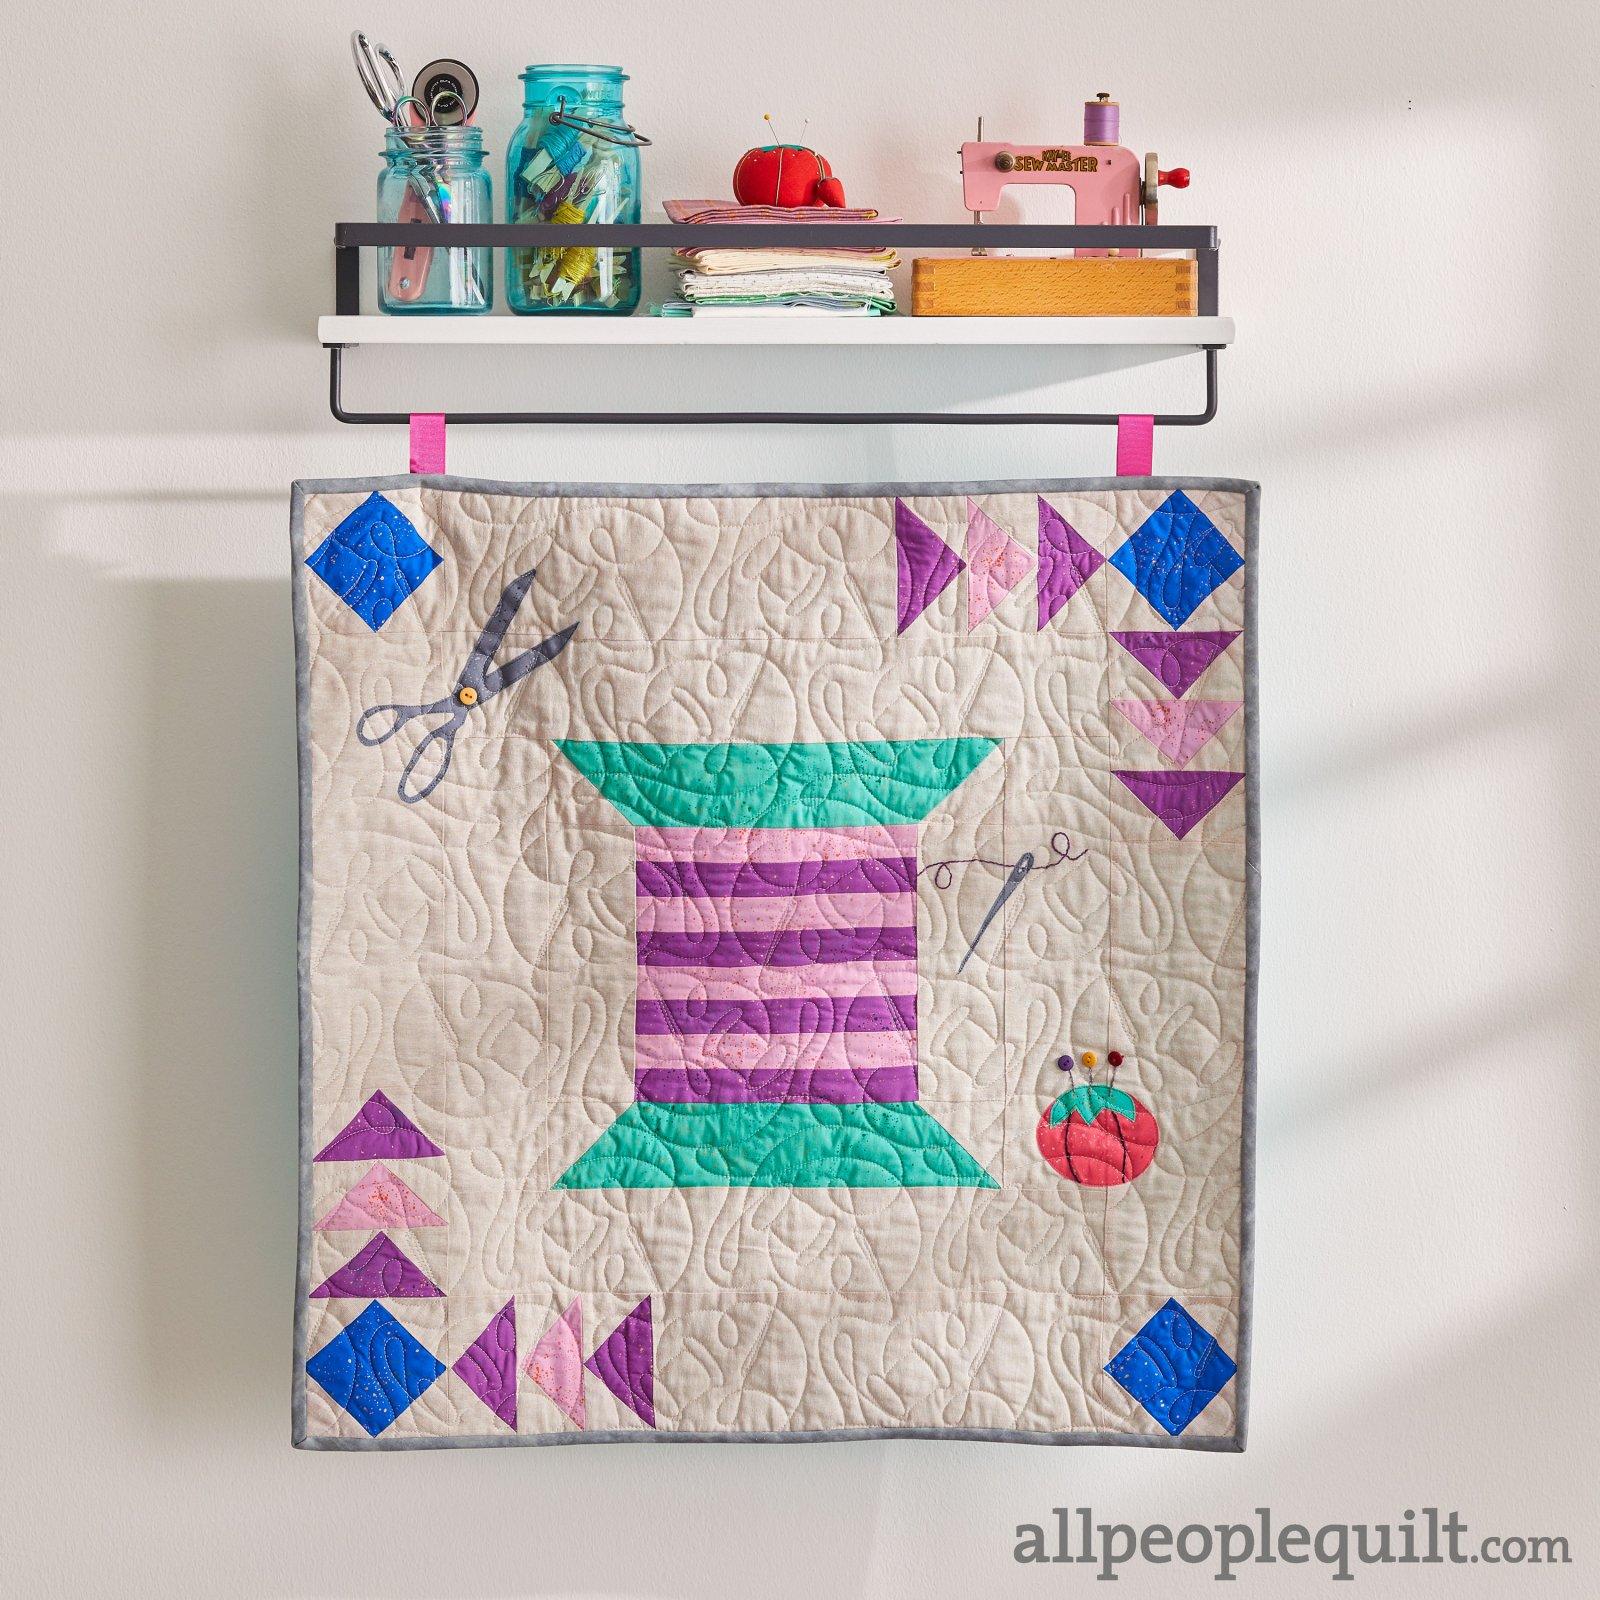 Sew Joyful Wallhanging Kit